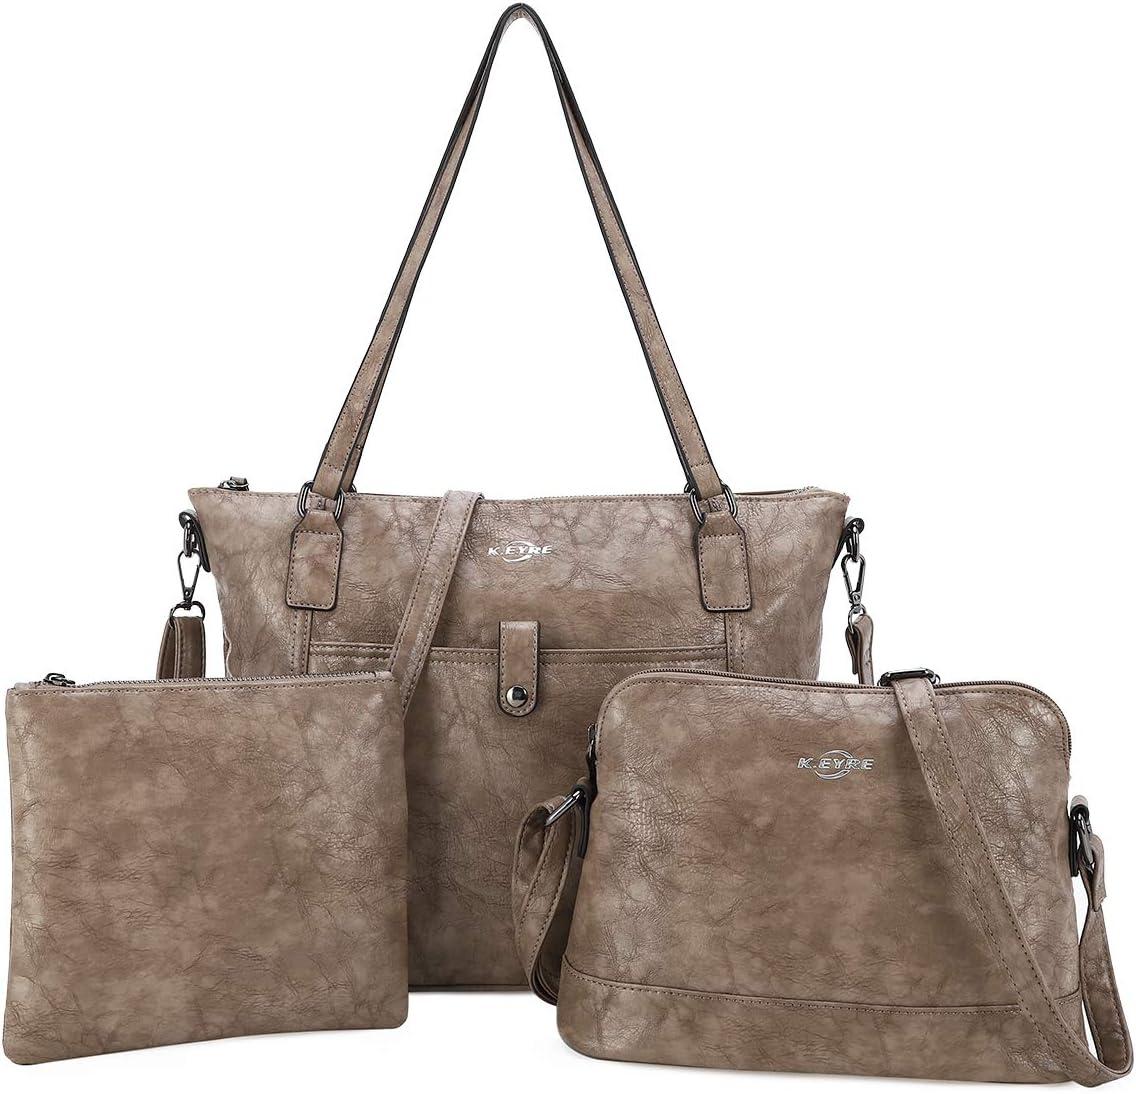 Women Shoulder Handbag Purse Top-Handle Hobo Roomy Casua Ladies' Shoulder Bag Fashion PU Tote Satchel Bag for Women (1A-KL2226#687#13KHAKI)